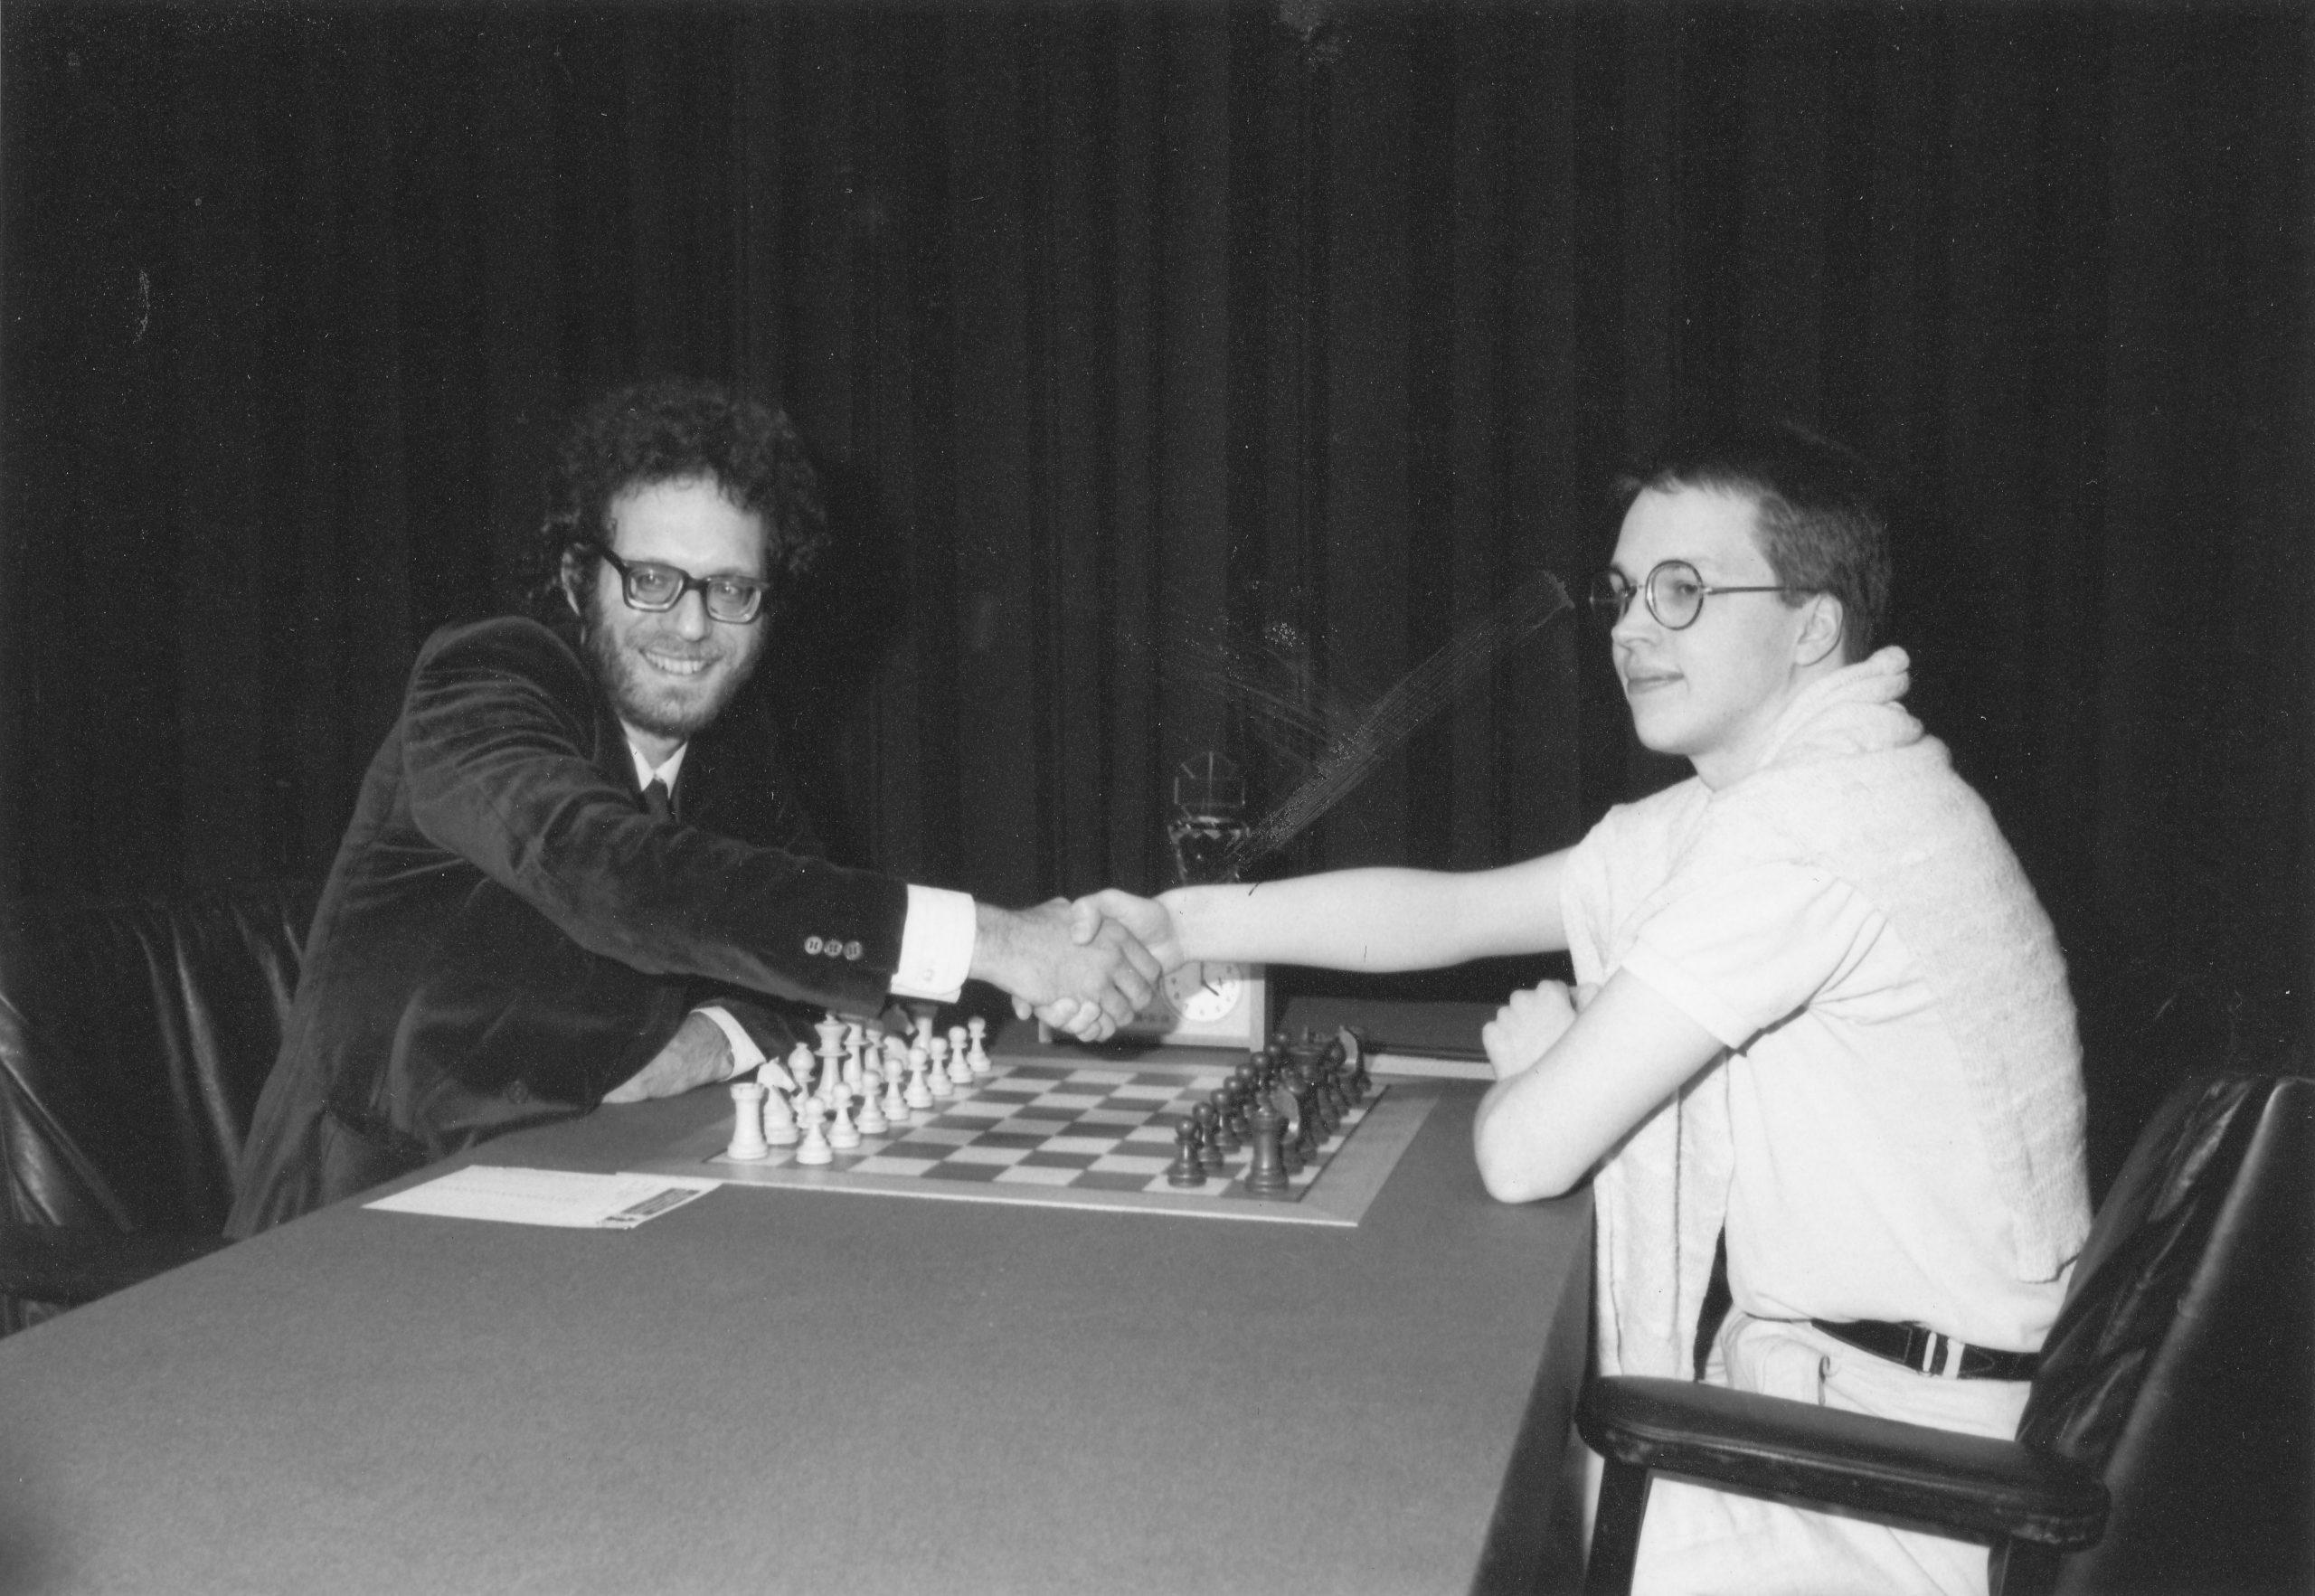 Jon Speelman and Nigel Short at the start of their 1989 Candidates match. Jon won 3.5 - 1.5